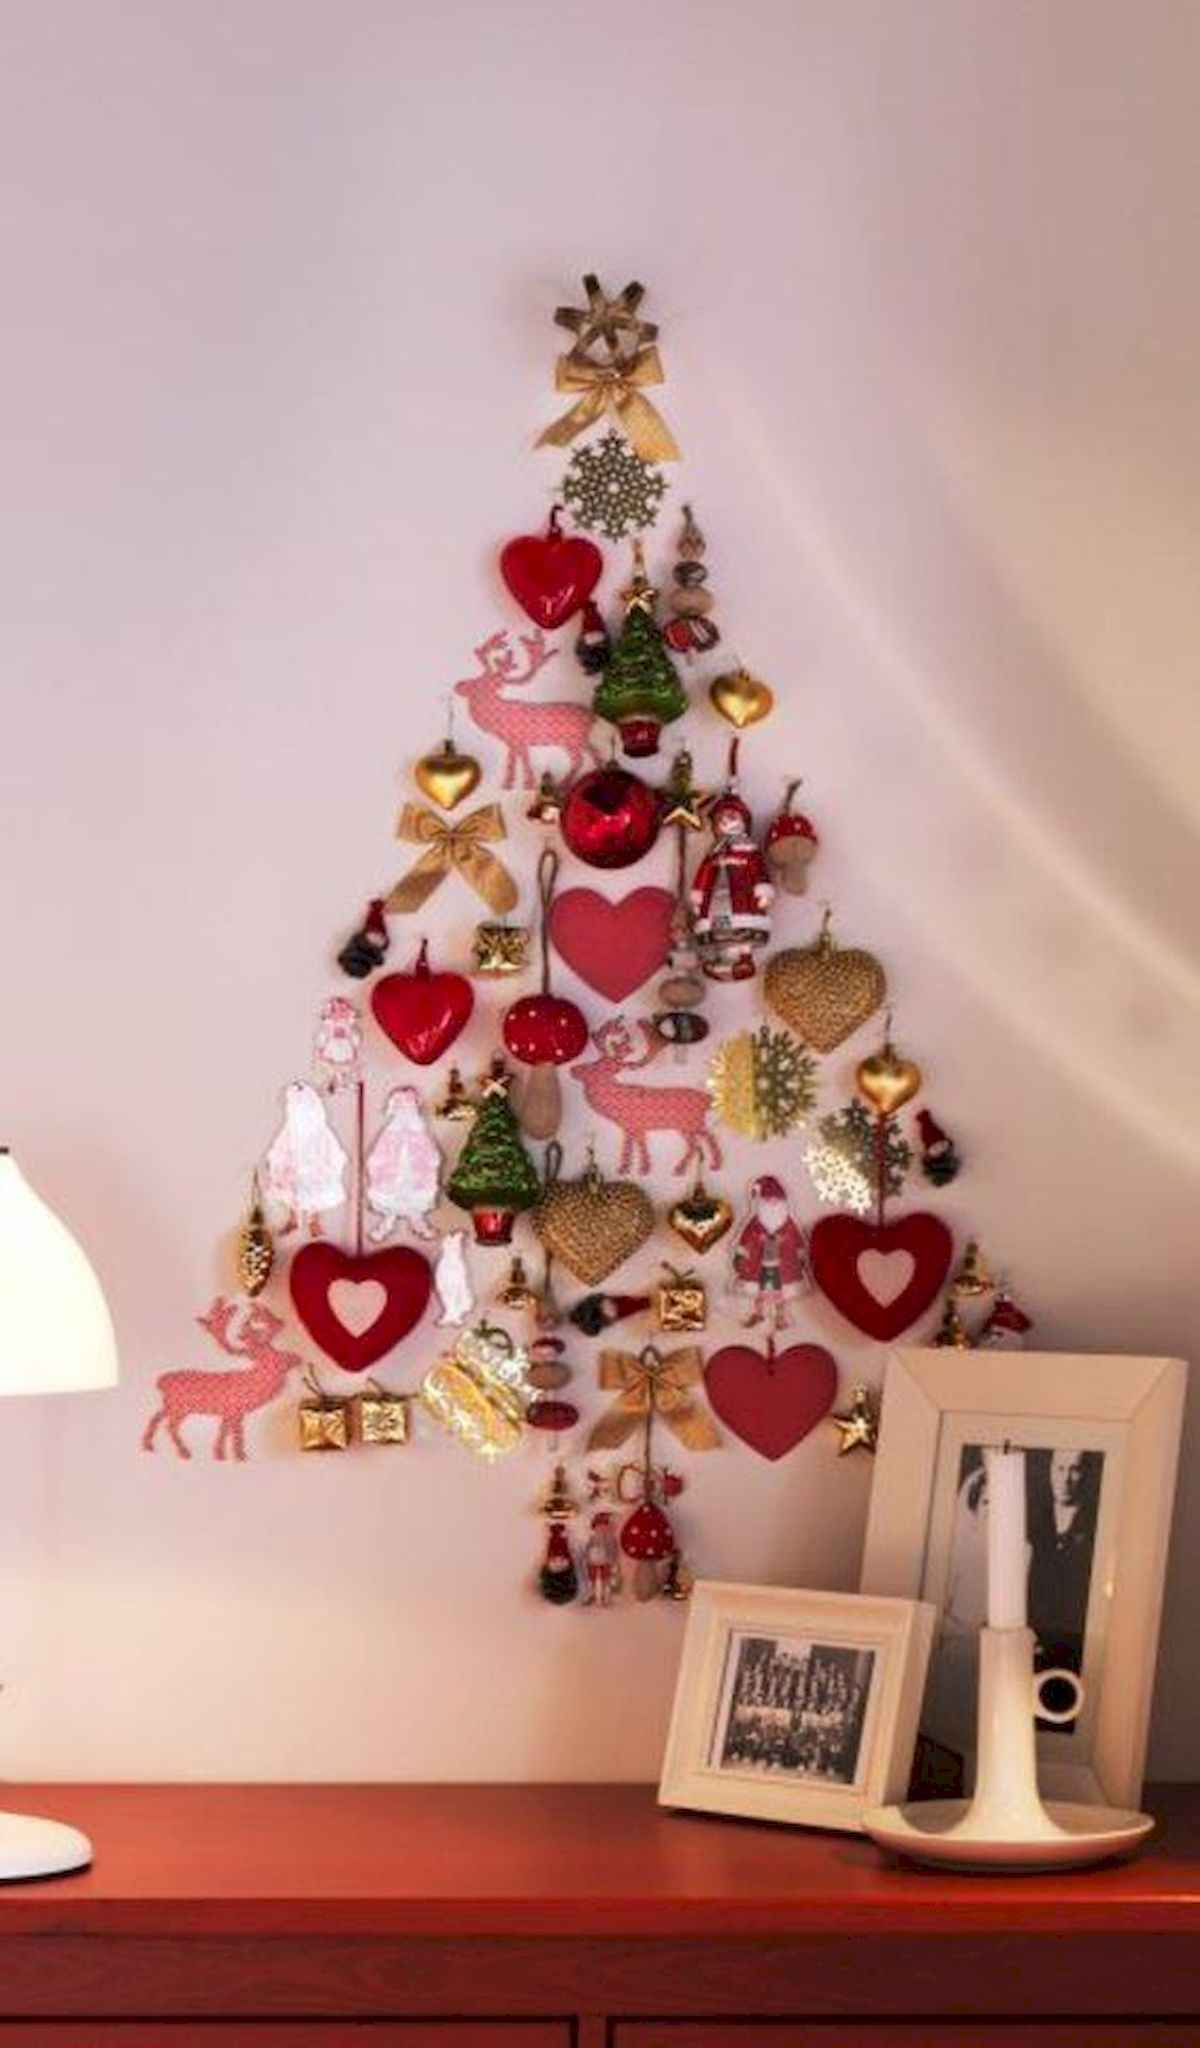 40 unique christmas tree ideas decorations (22)